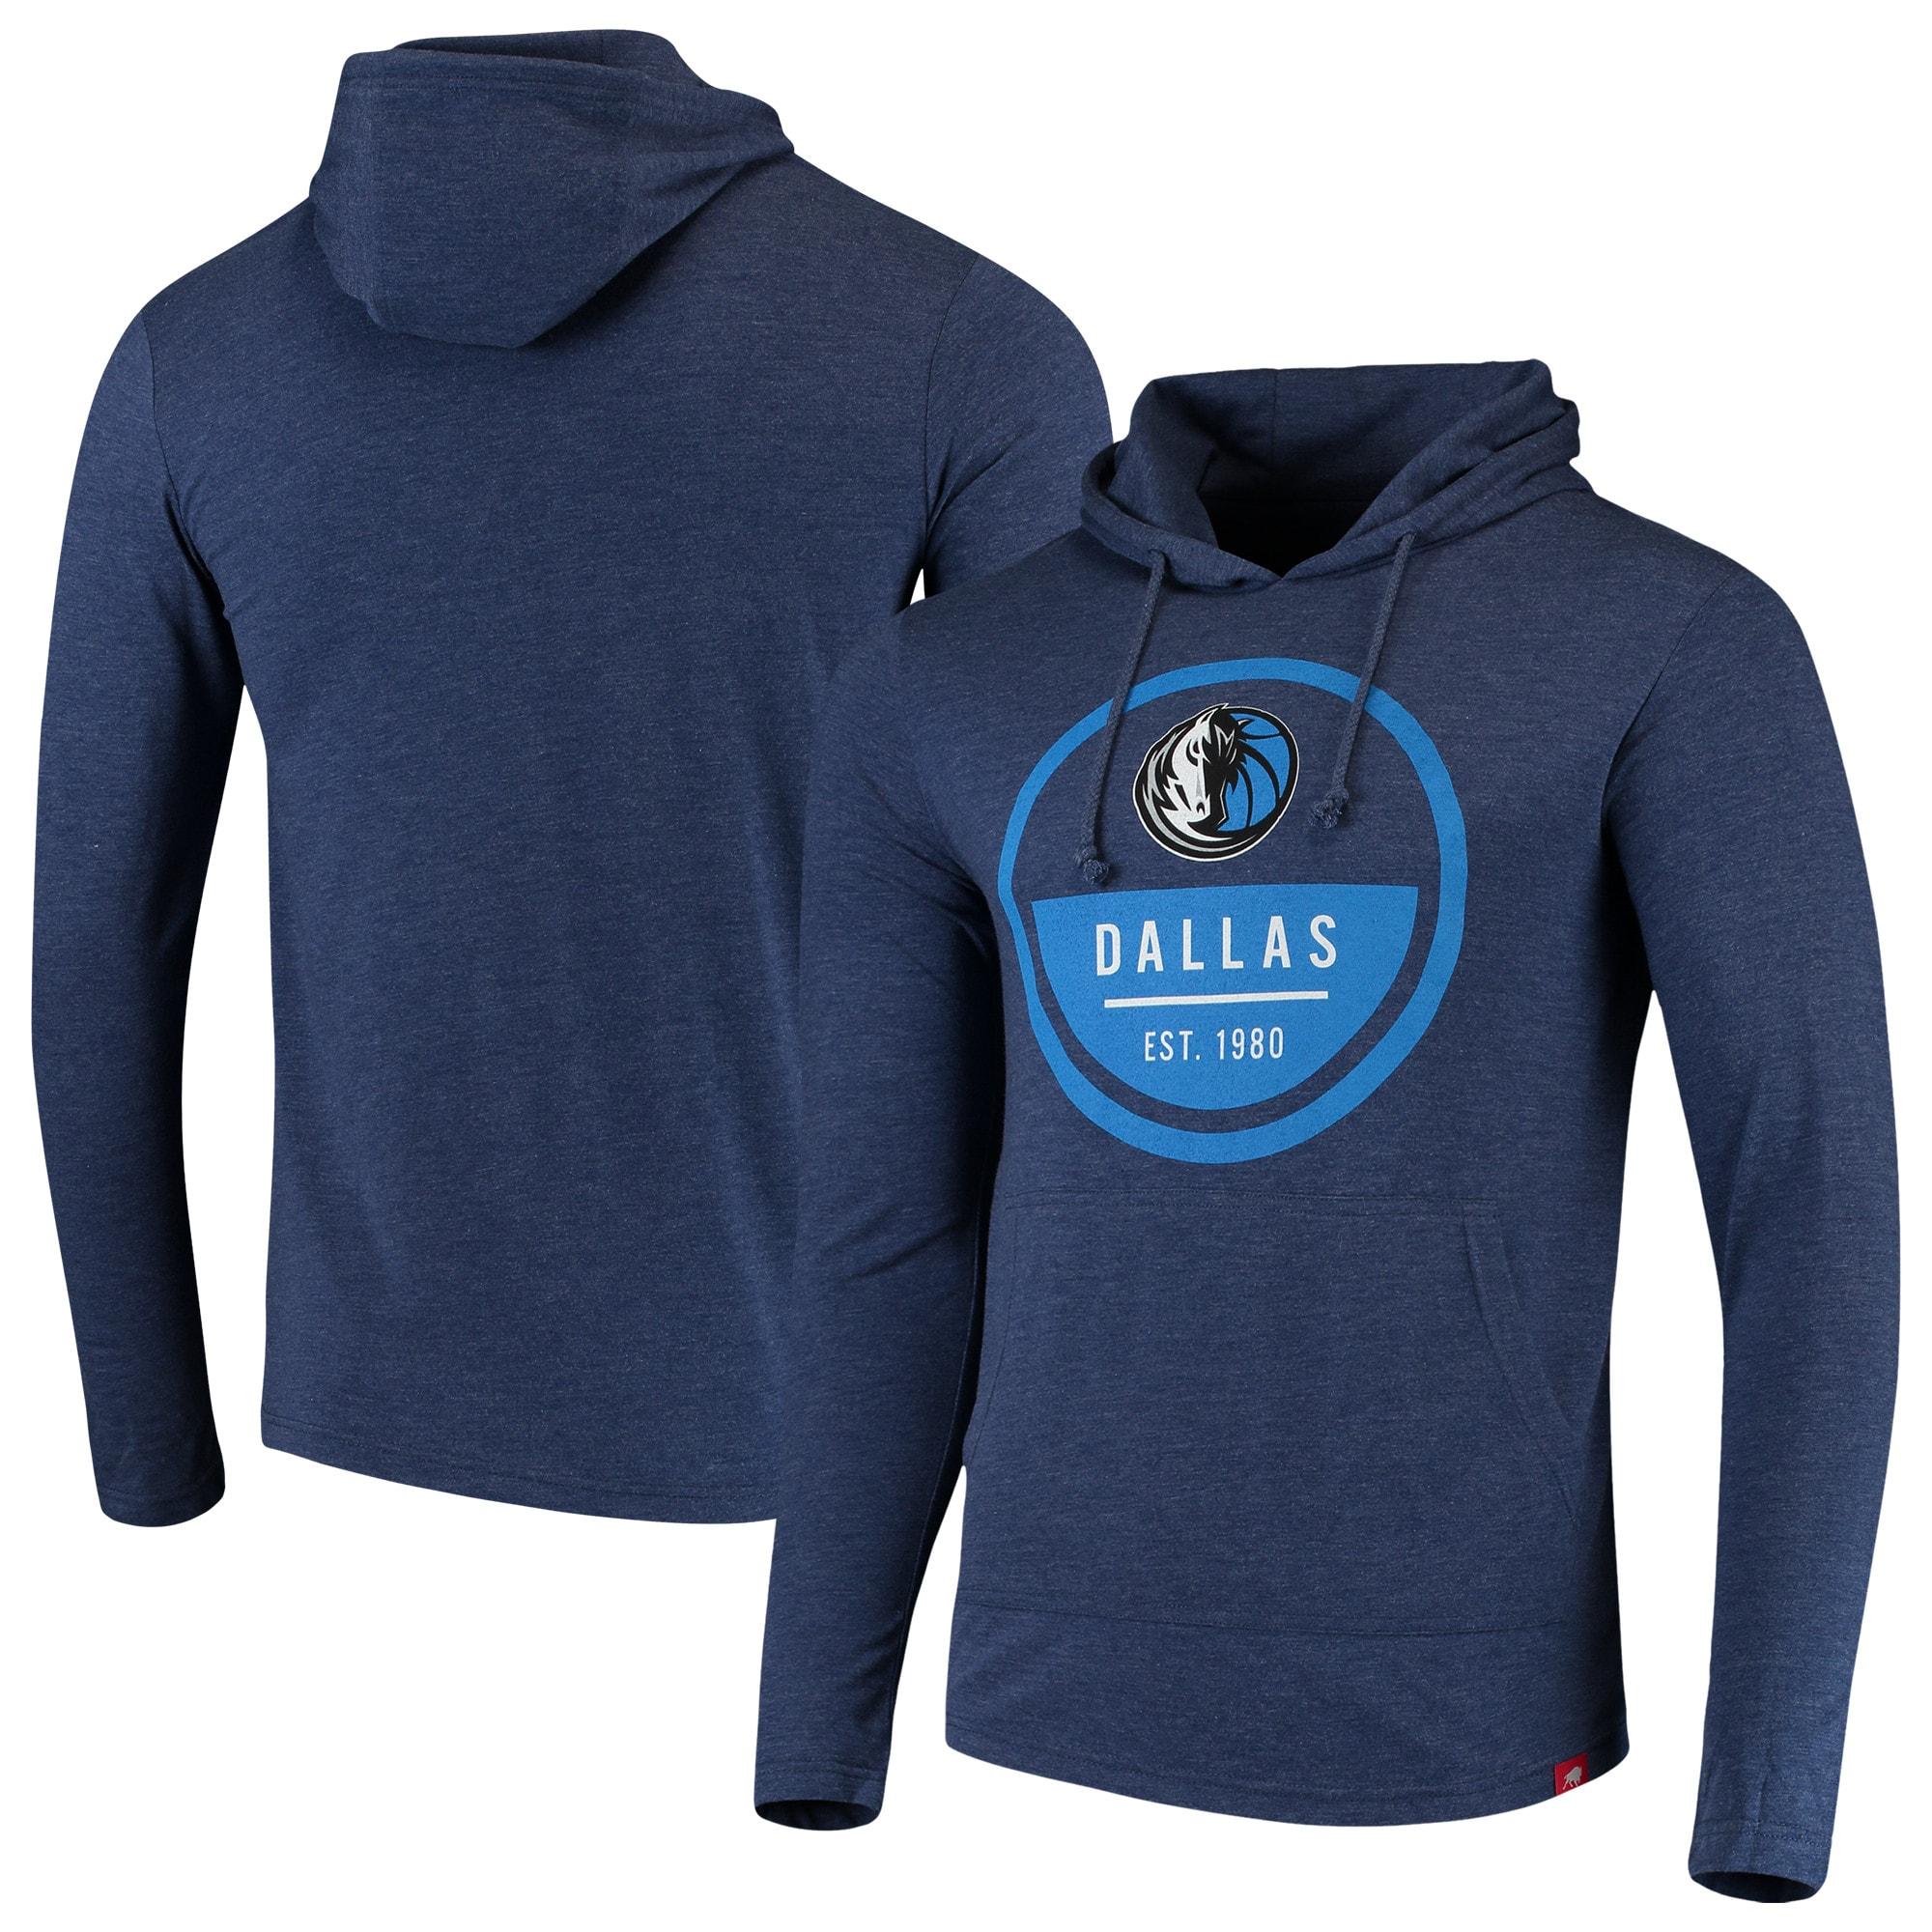 Dallas Mavericks Sportiqe Rowan Tri-Blend Jersey Hoodie - Heathered Navy